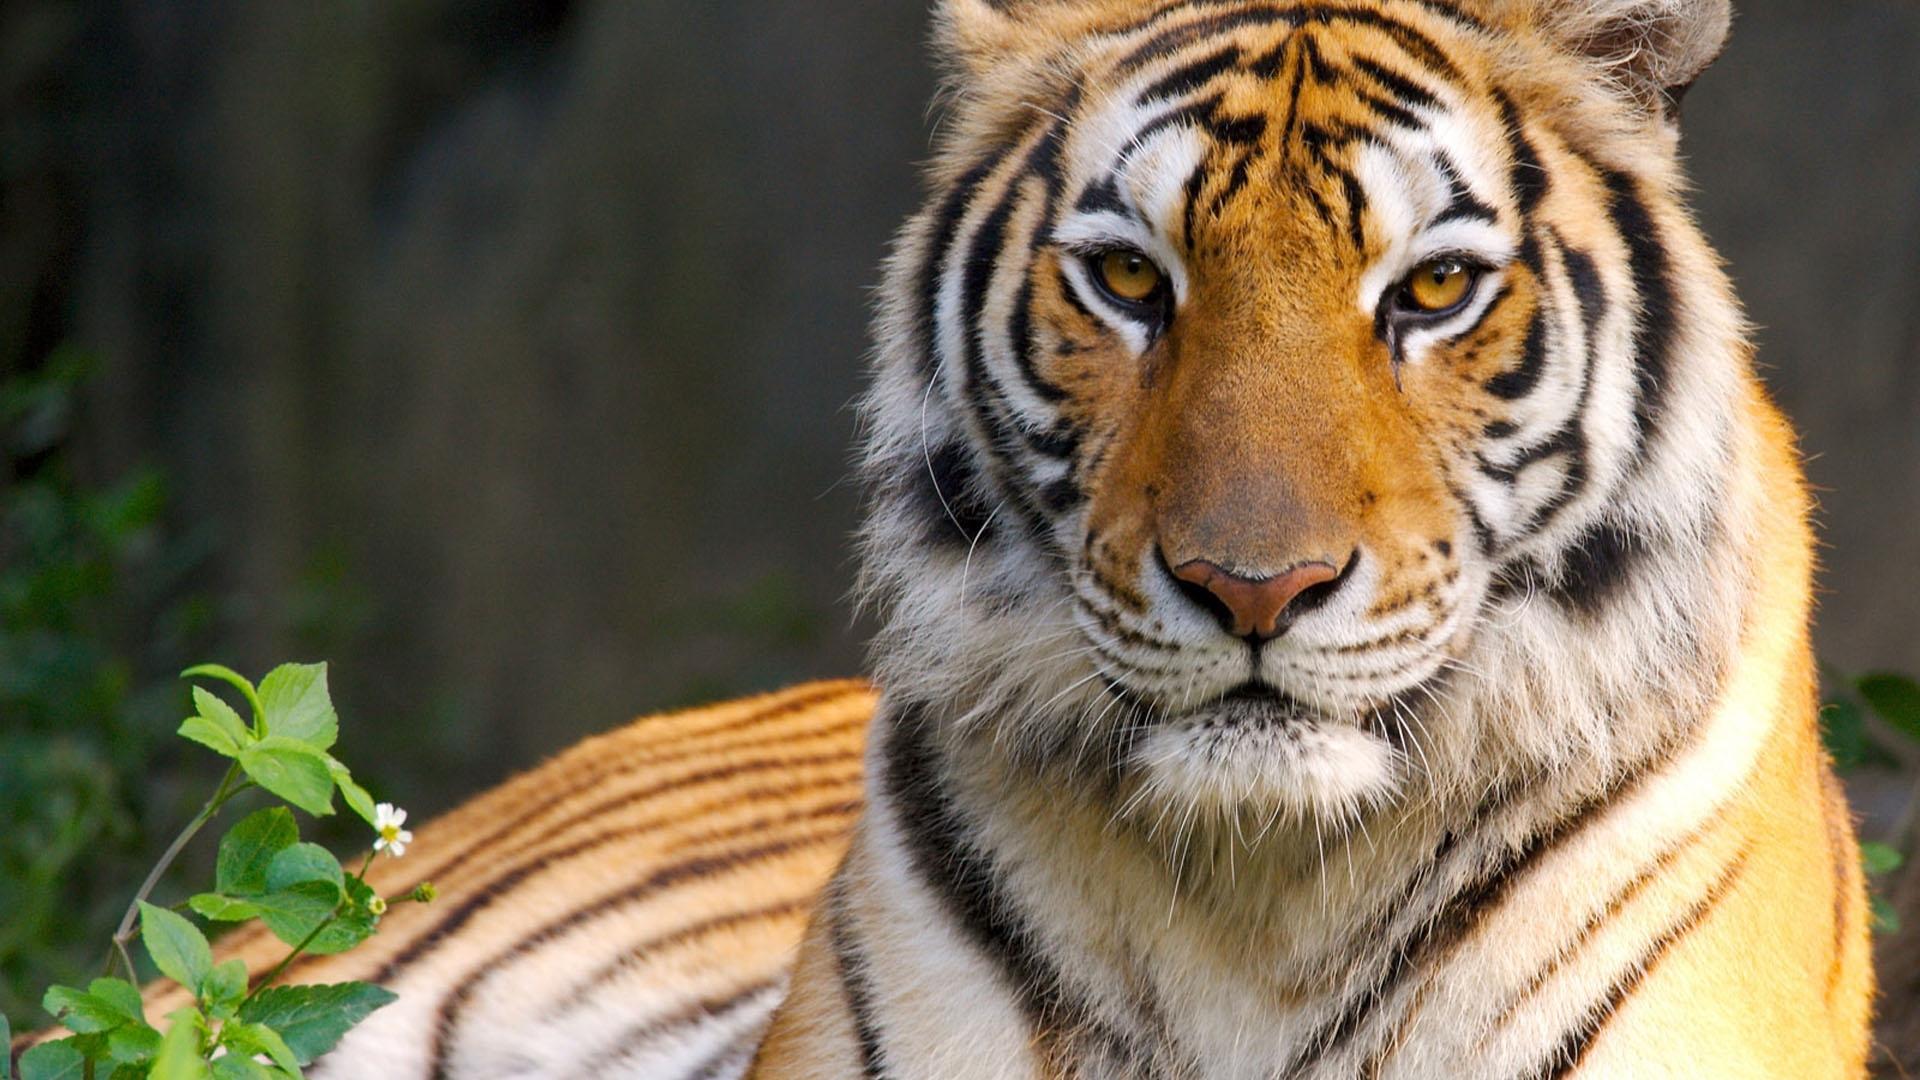 Tiger wallpapers hd SF